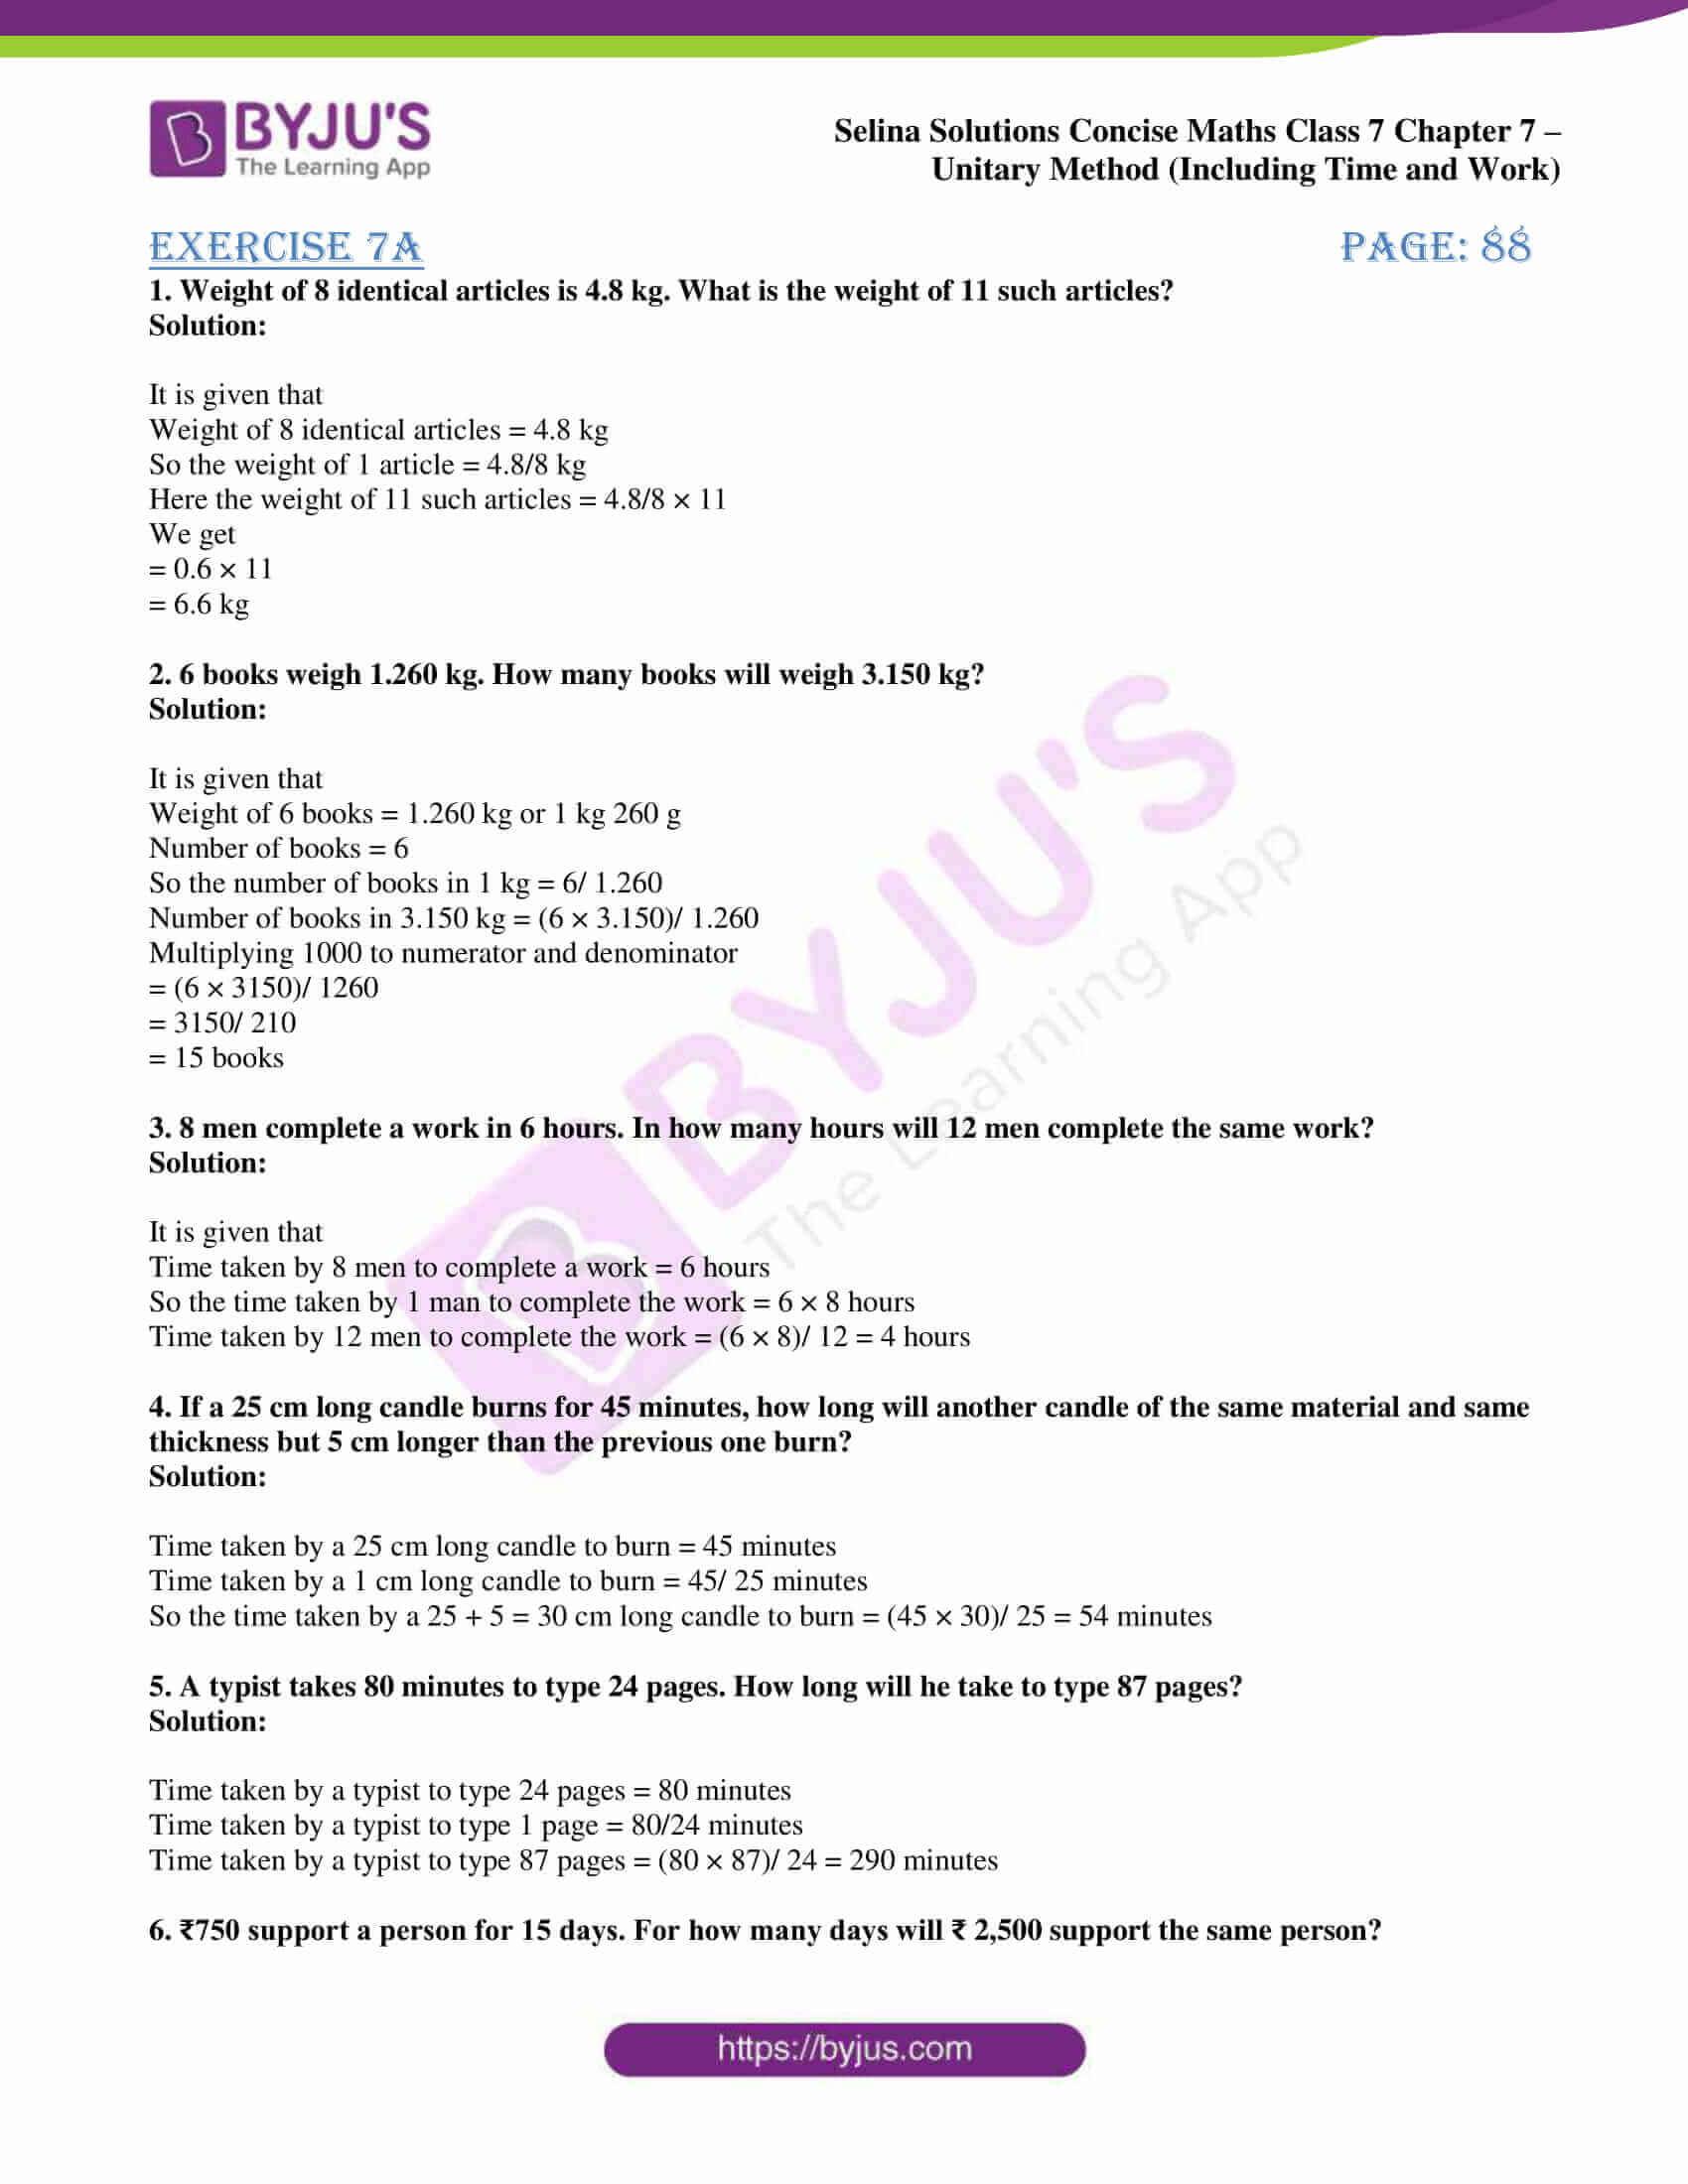 selina sol concise maths class 7 ch7 ex 7a 1